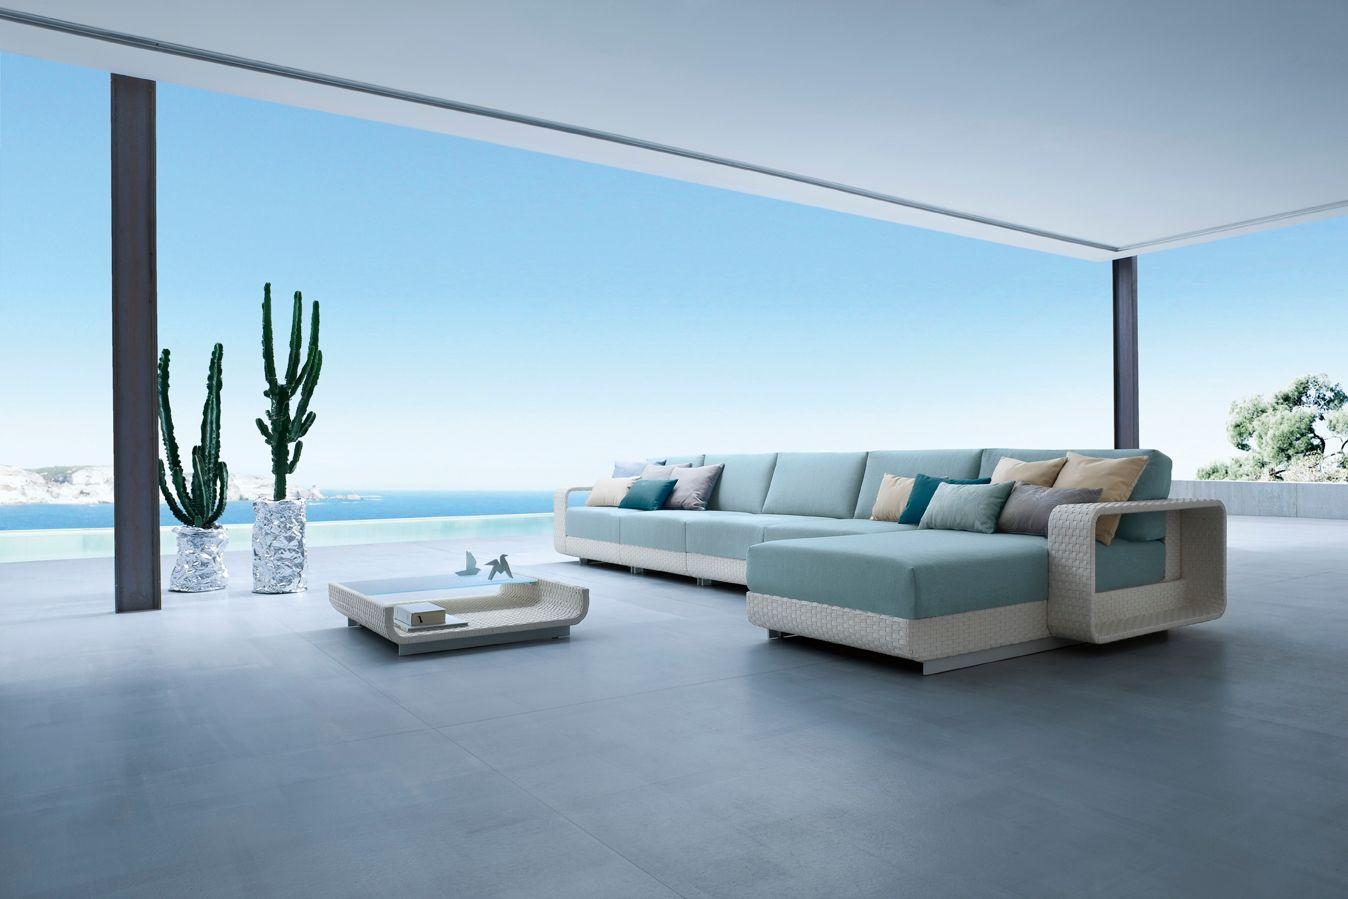 Hamptons Sectional Garden Sofa By Roberti Rattan Design